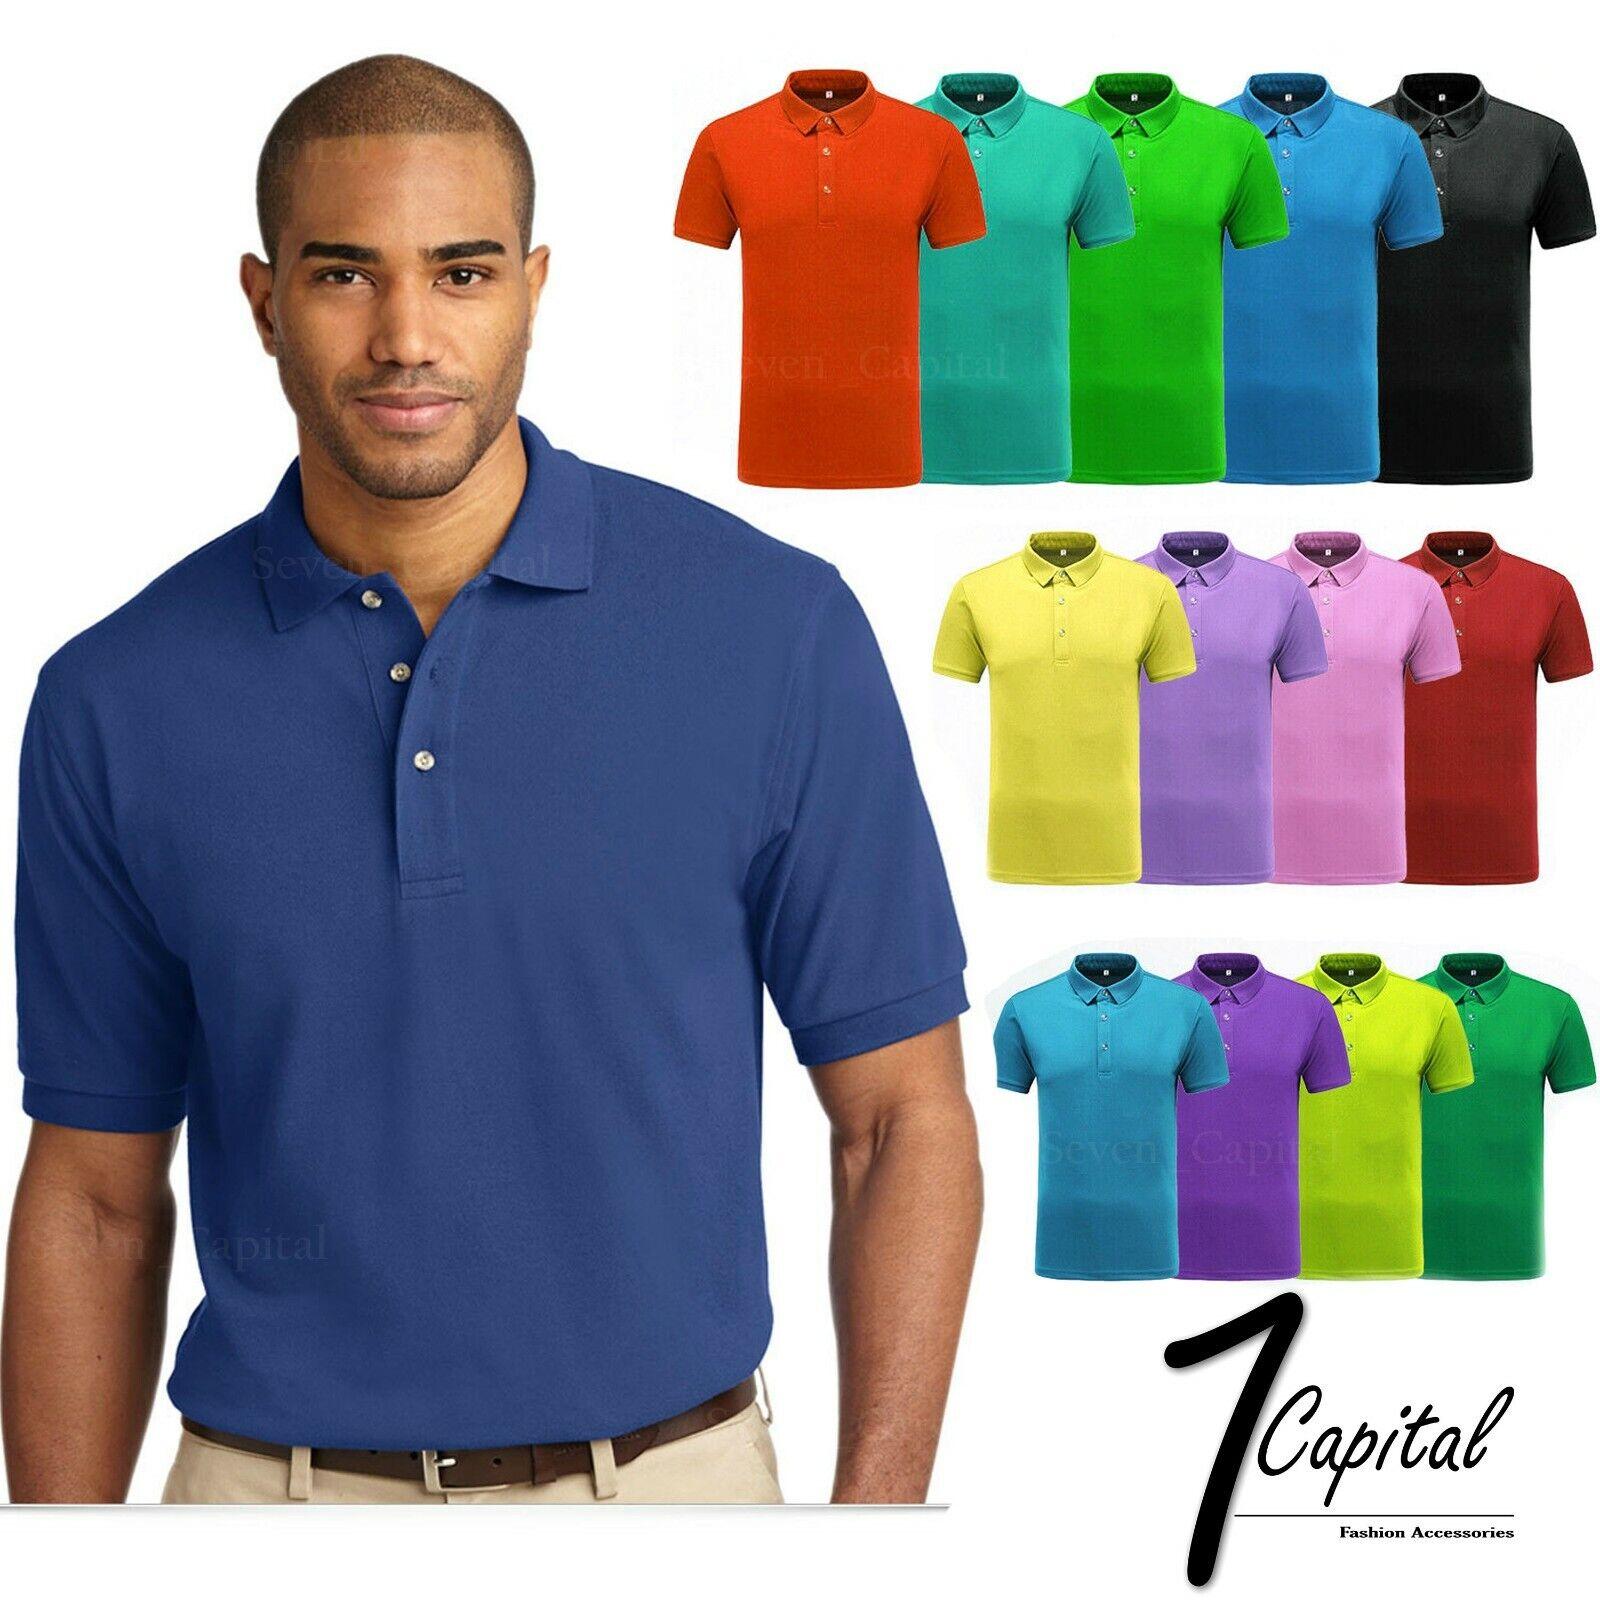 Men's Polo Shirt Dri-Fit Golf Sports Cotton T Shirt Jersey C